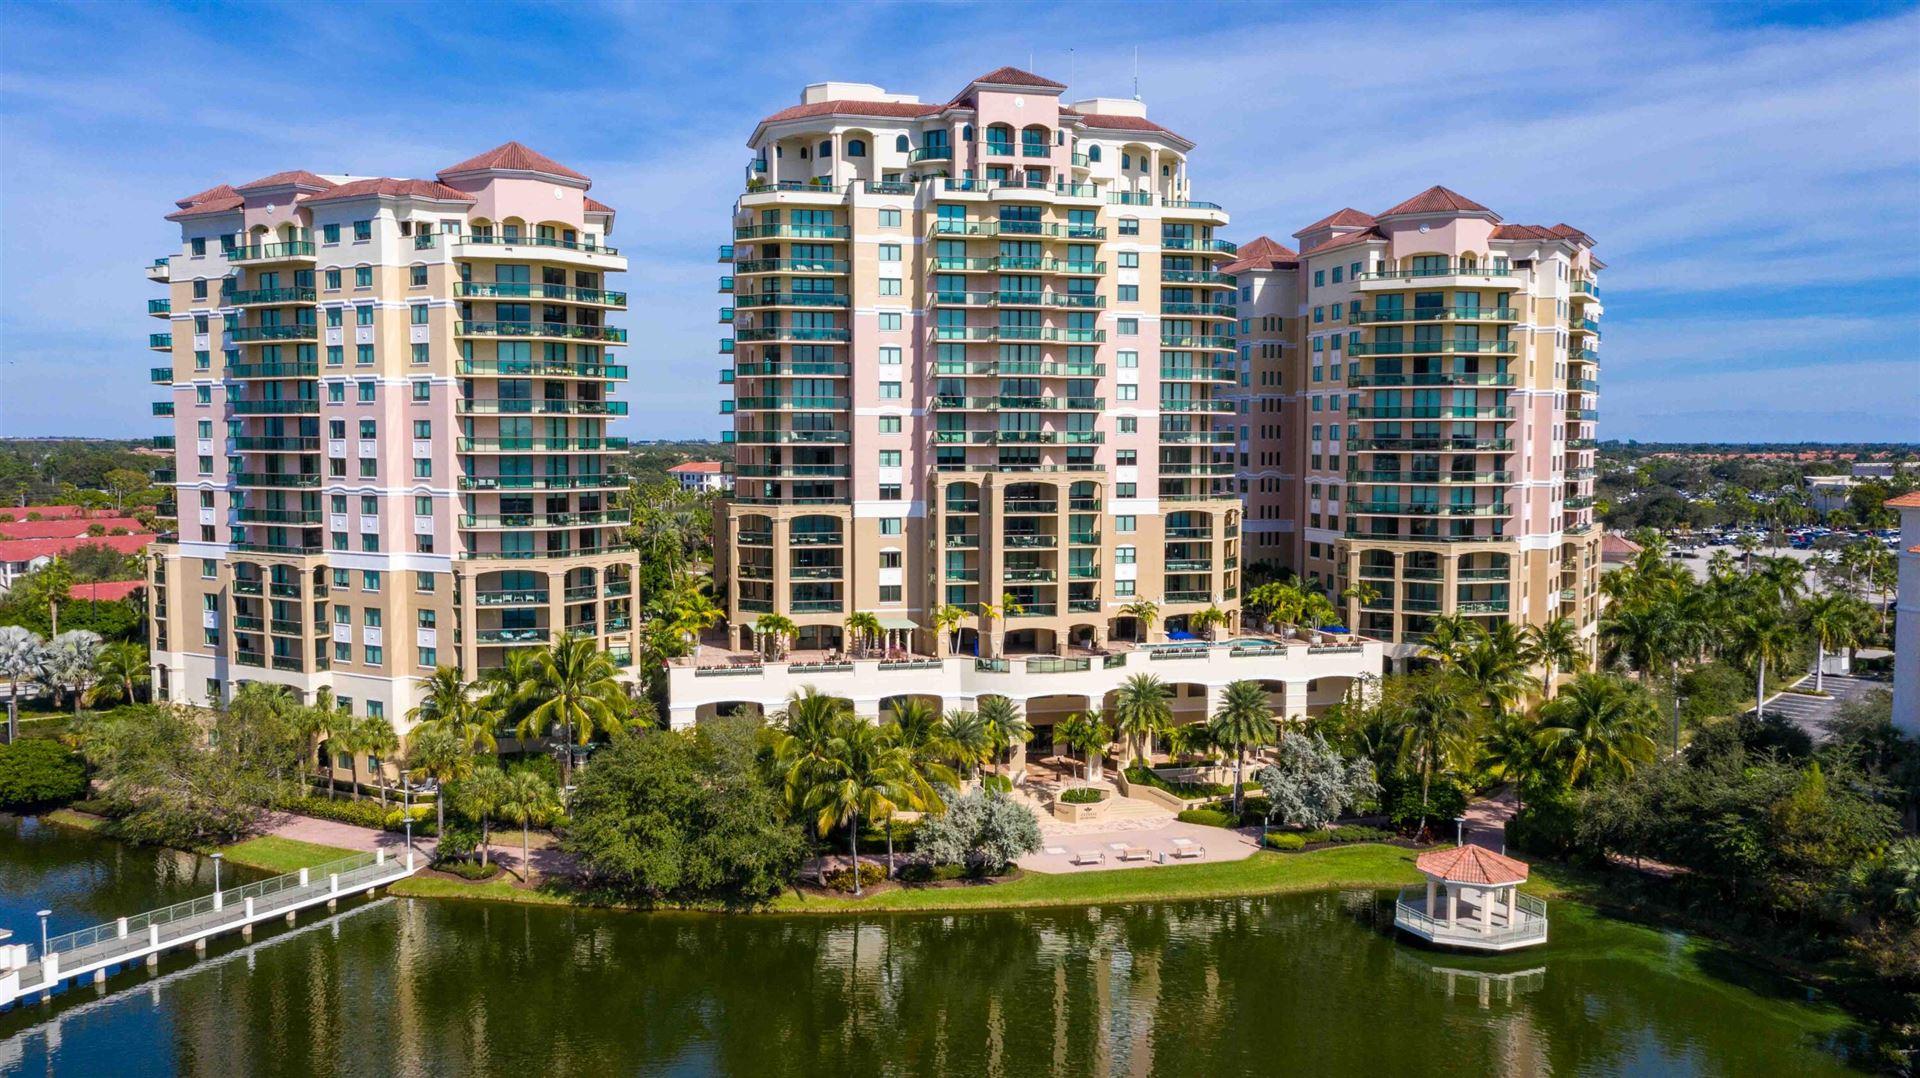 Photo for 3630 Gardens Parkway #803c, Palm Beach Gardens, FL 33410 (MLS # RX-10751748)